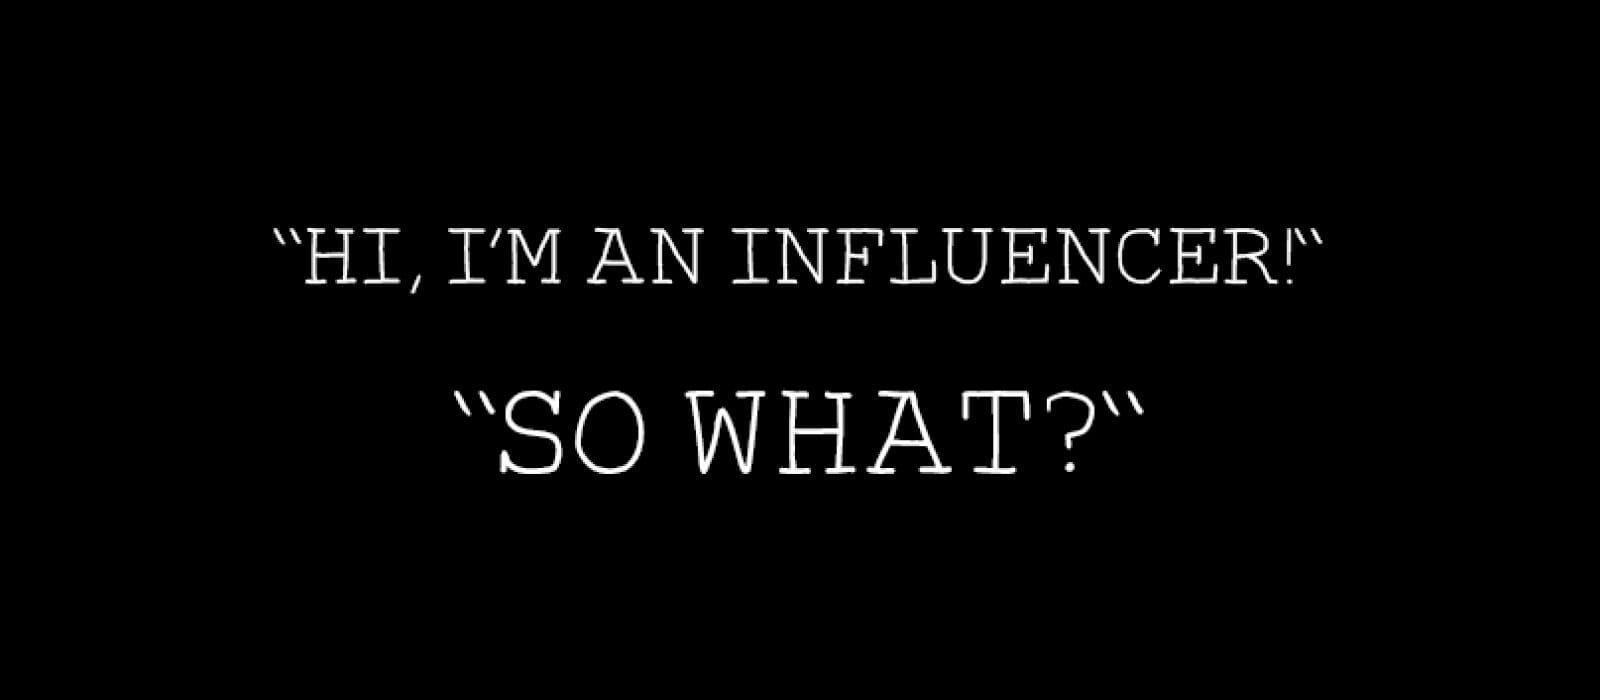 Influencer vs Consumer